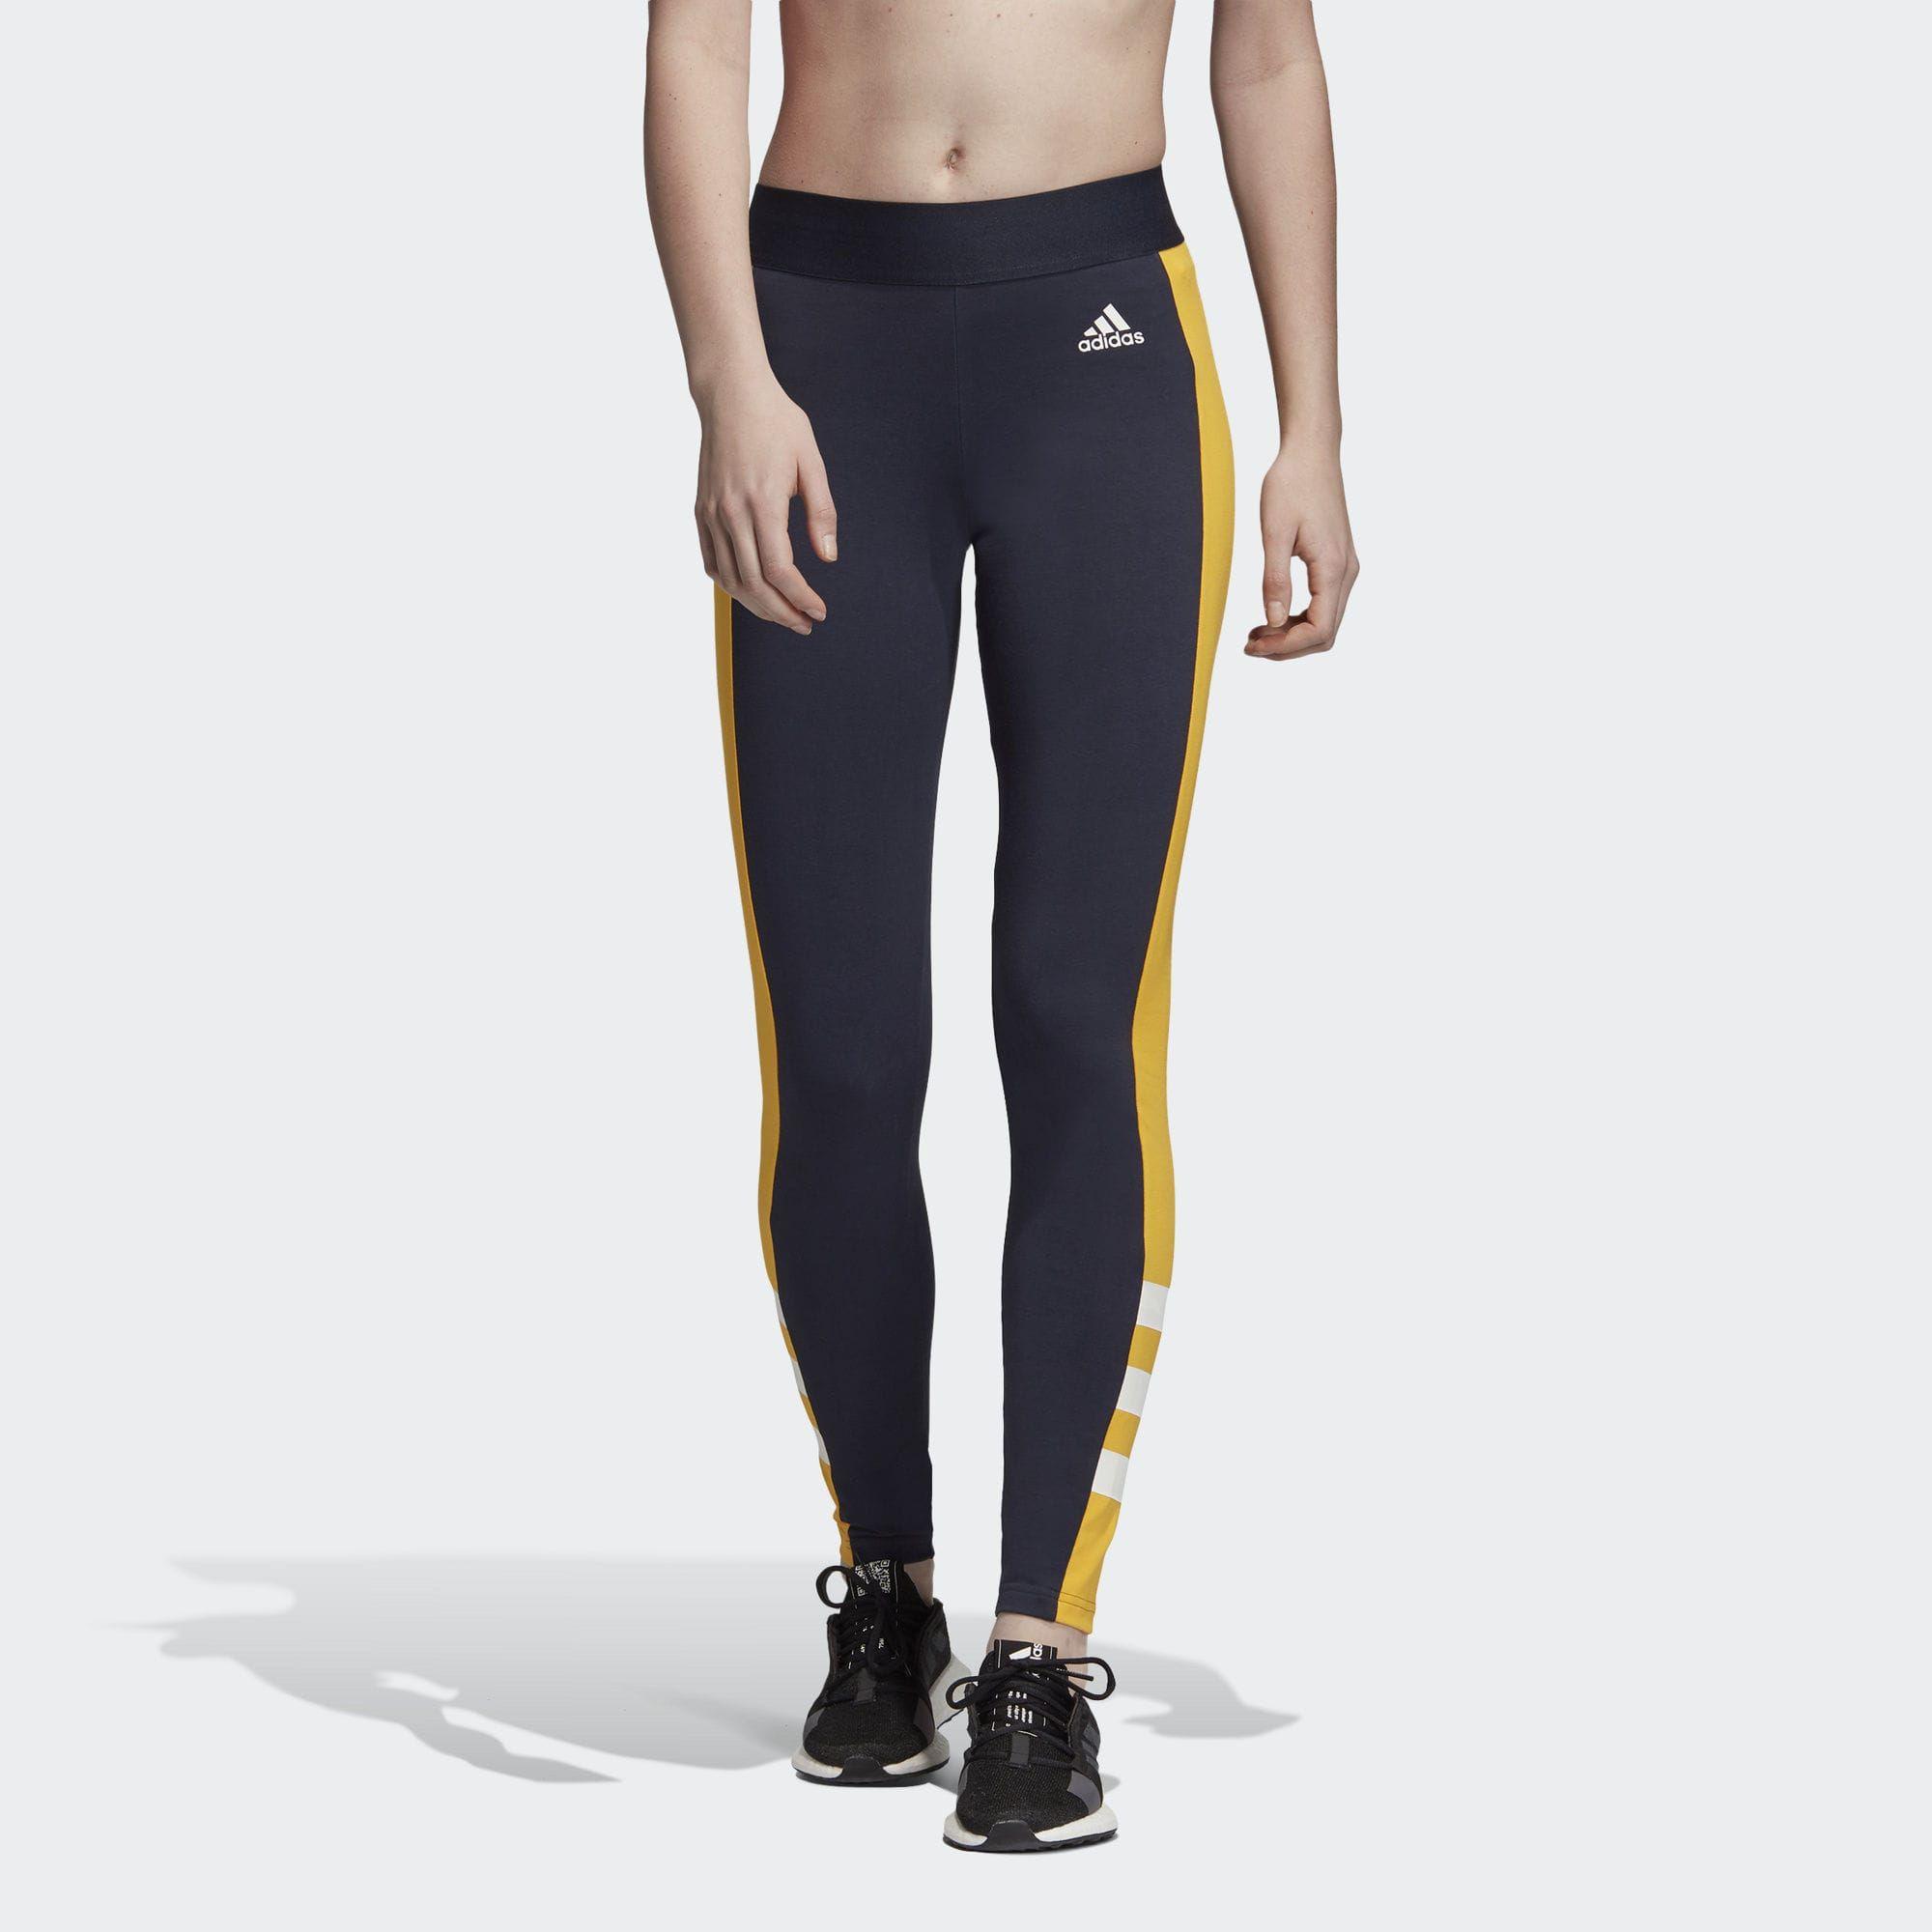 ADIDAS PERFORMANCE Leggings 'Sport ID' Damen, Ultramarinblau